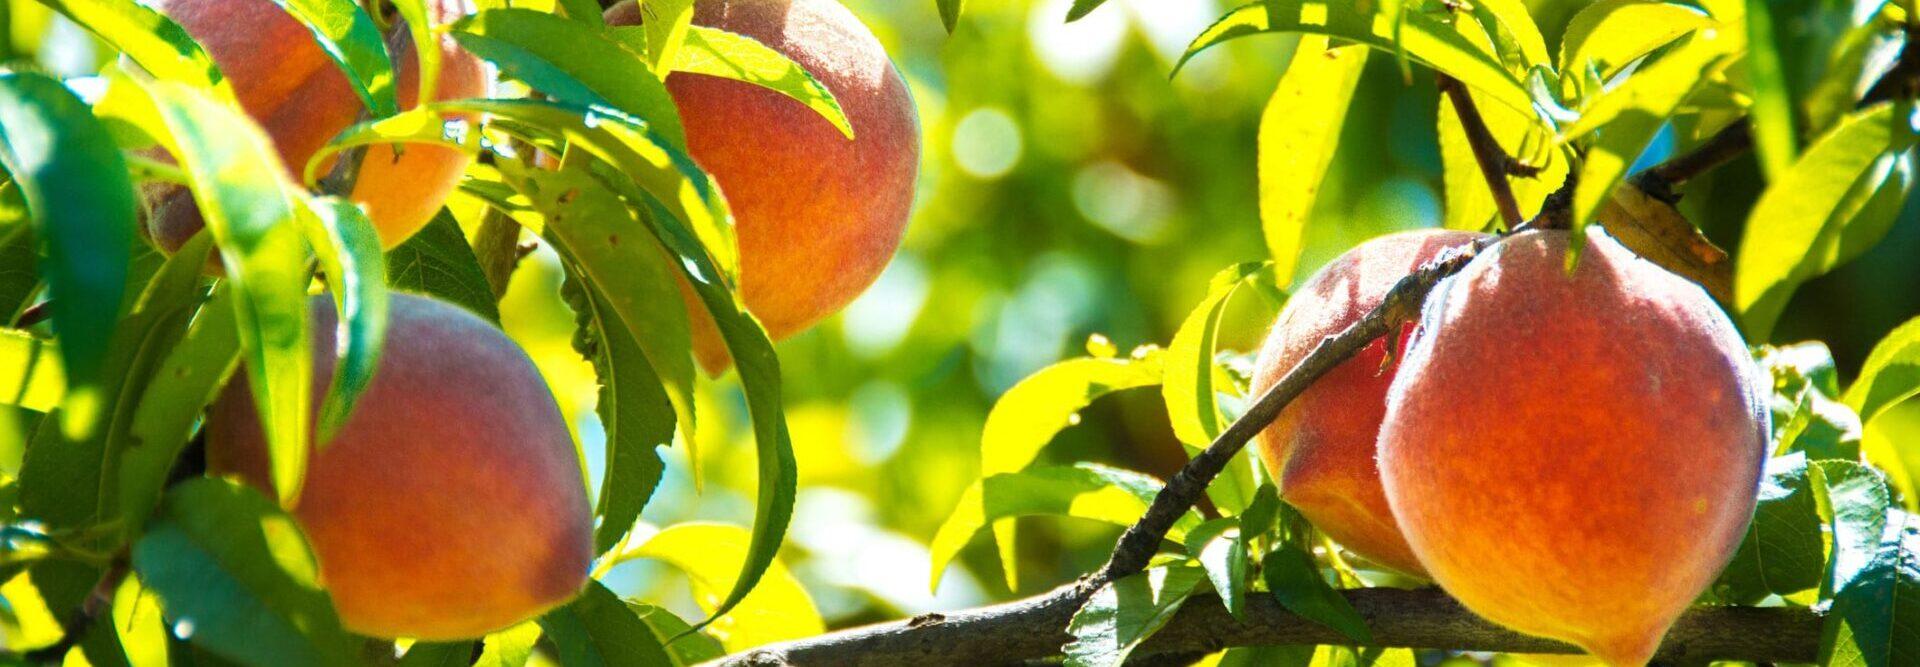 peaches-on-tree